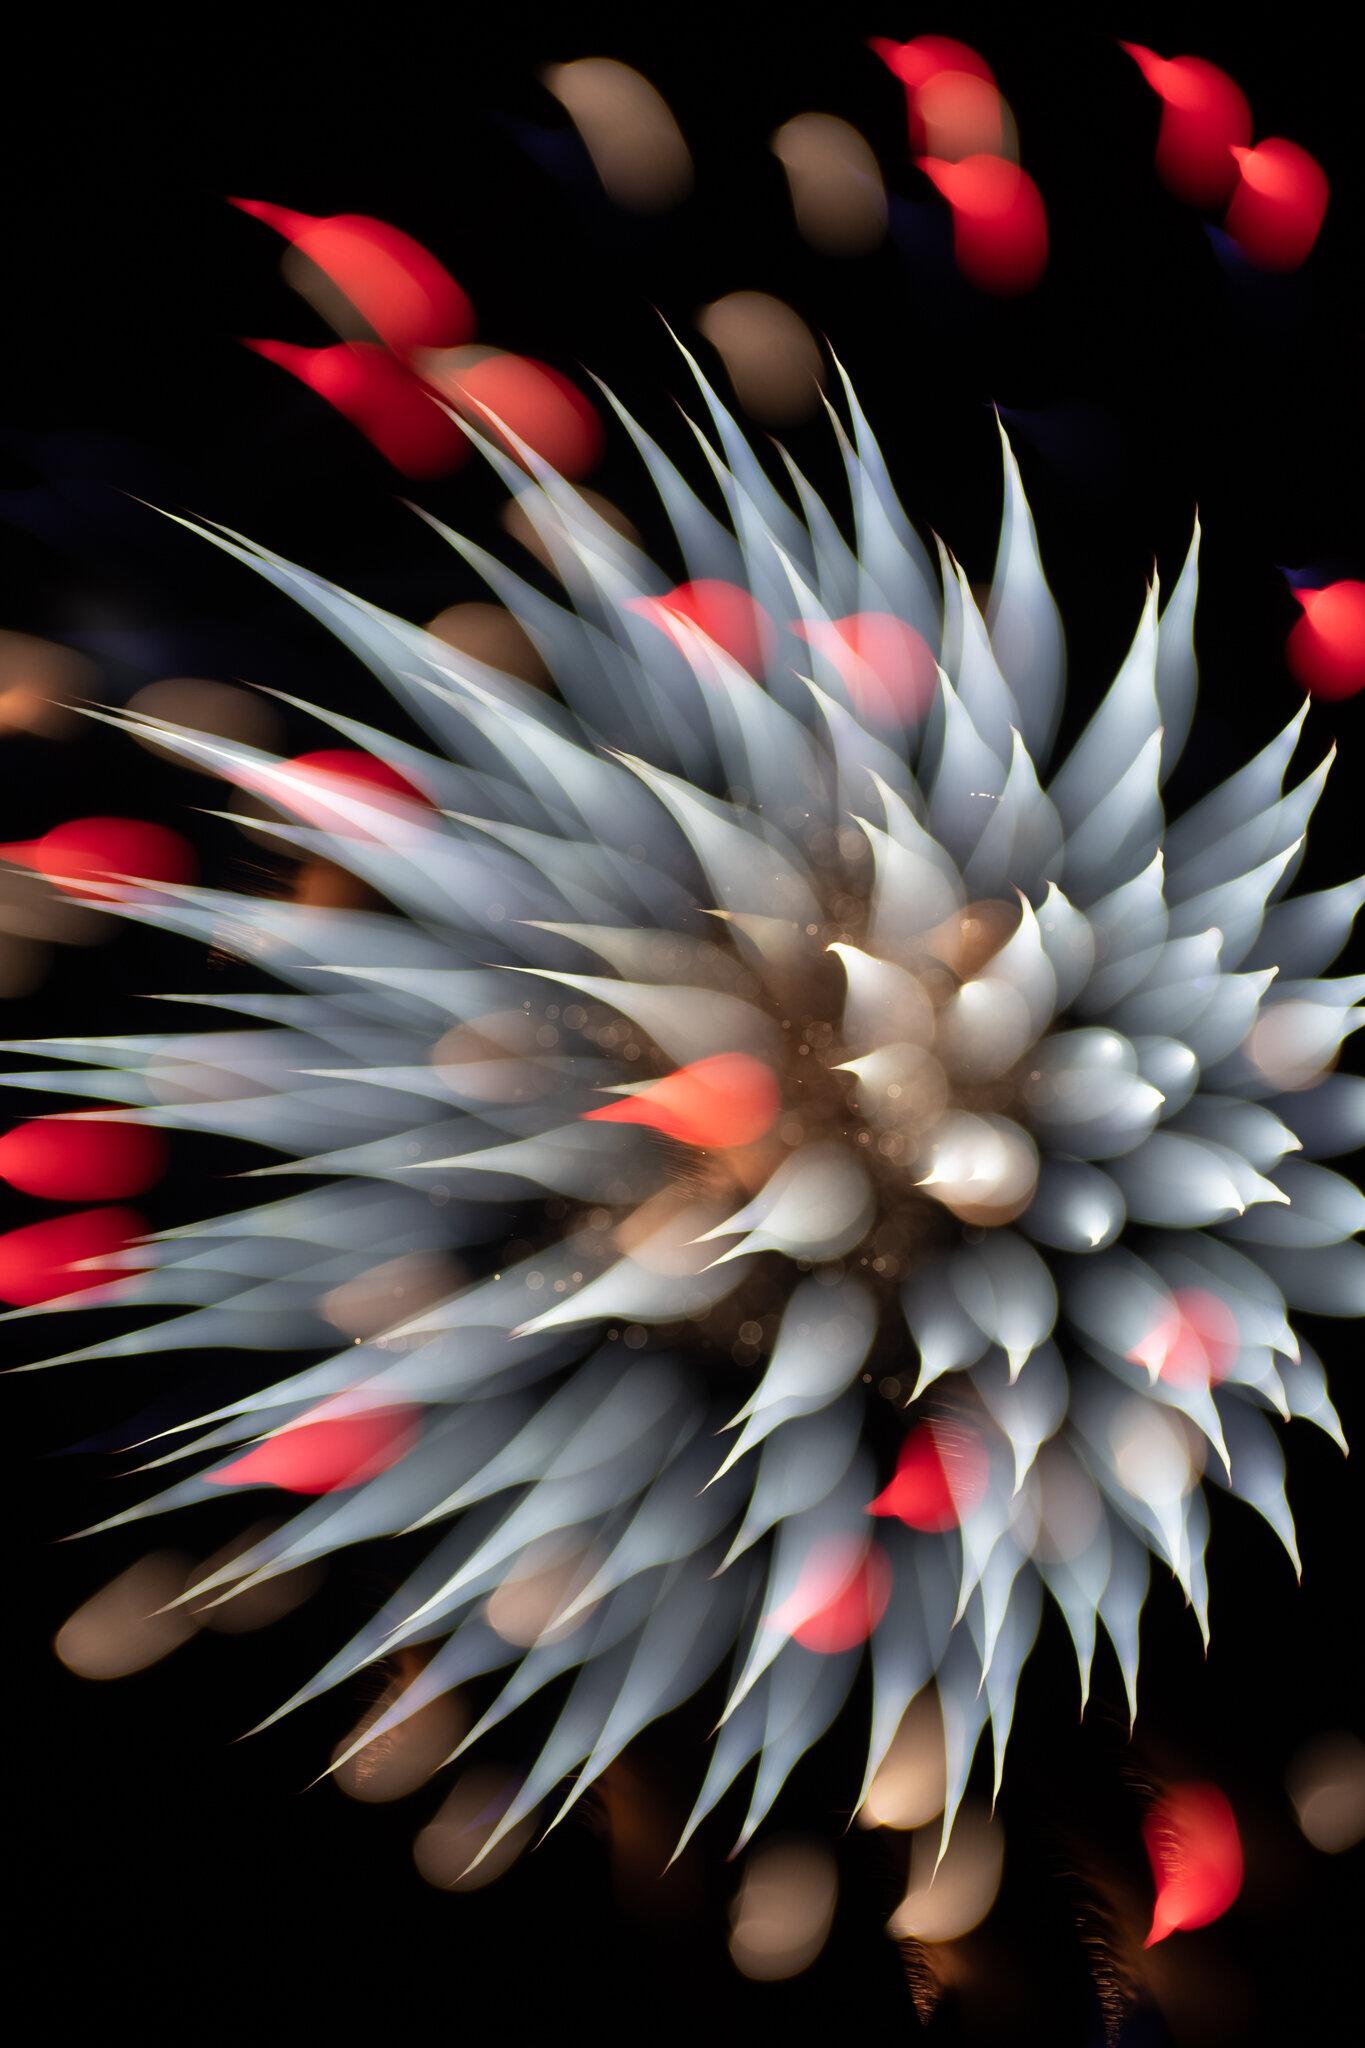 focuspulledfireworks-7.jpg